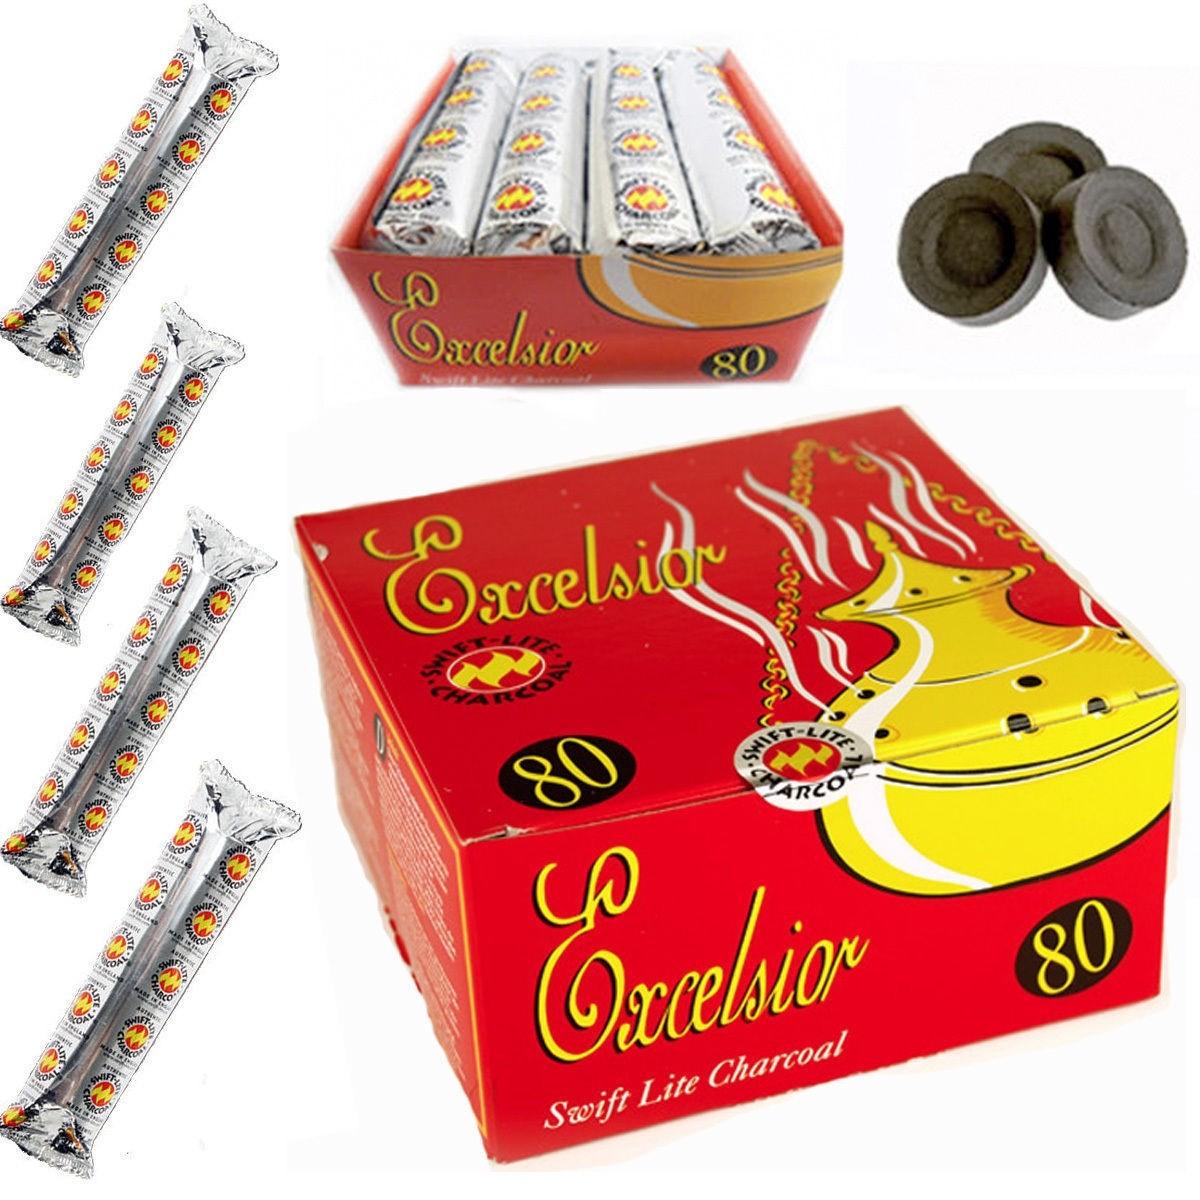 Excelsior Swift-Lite Charcoal Tablets